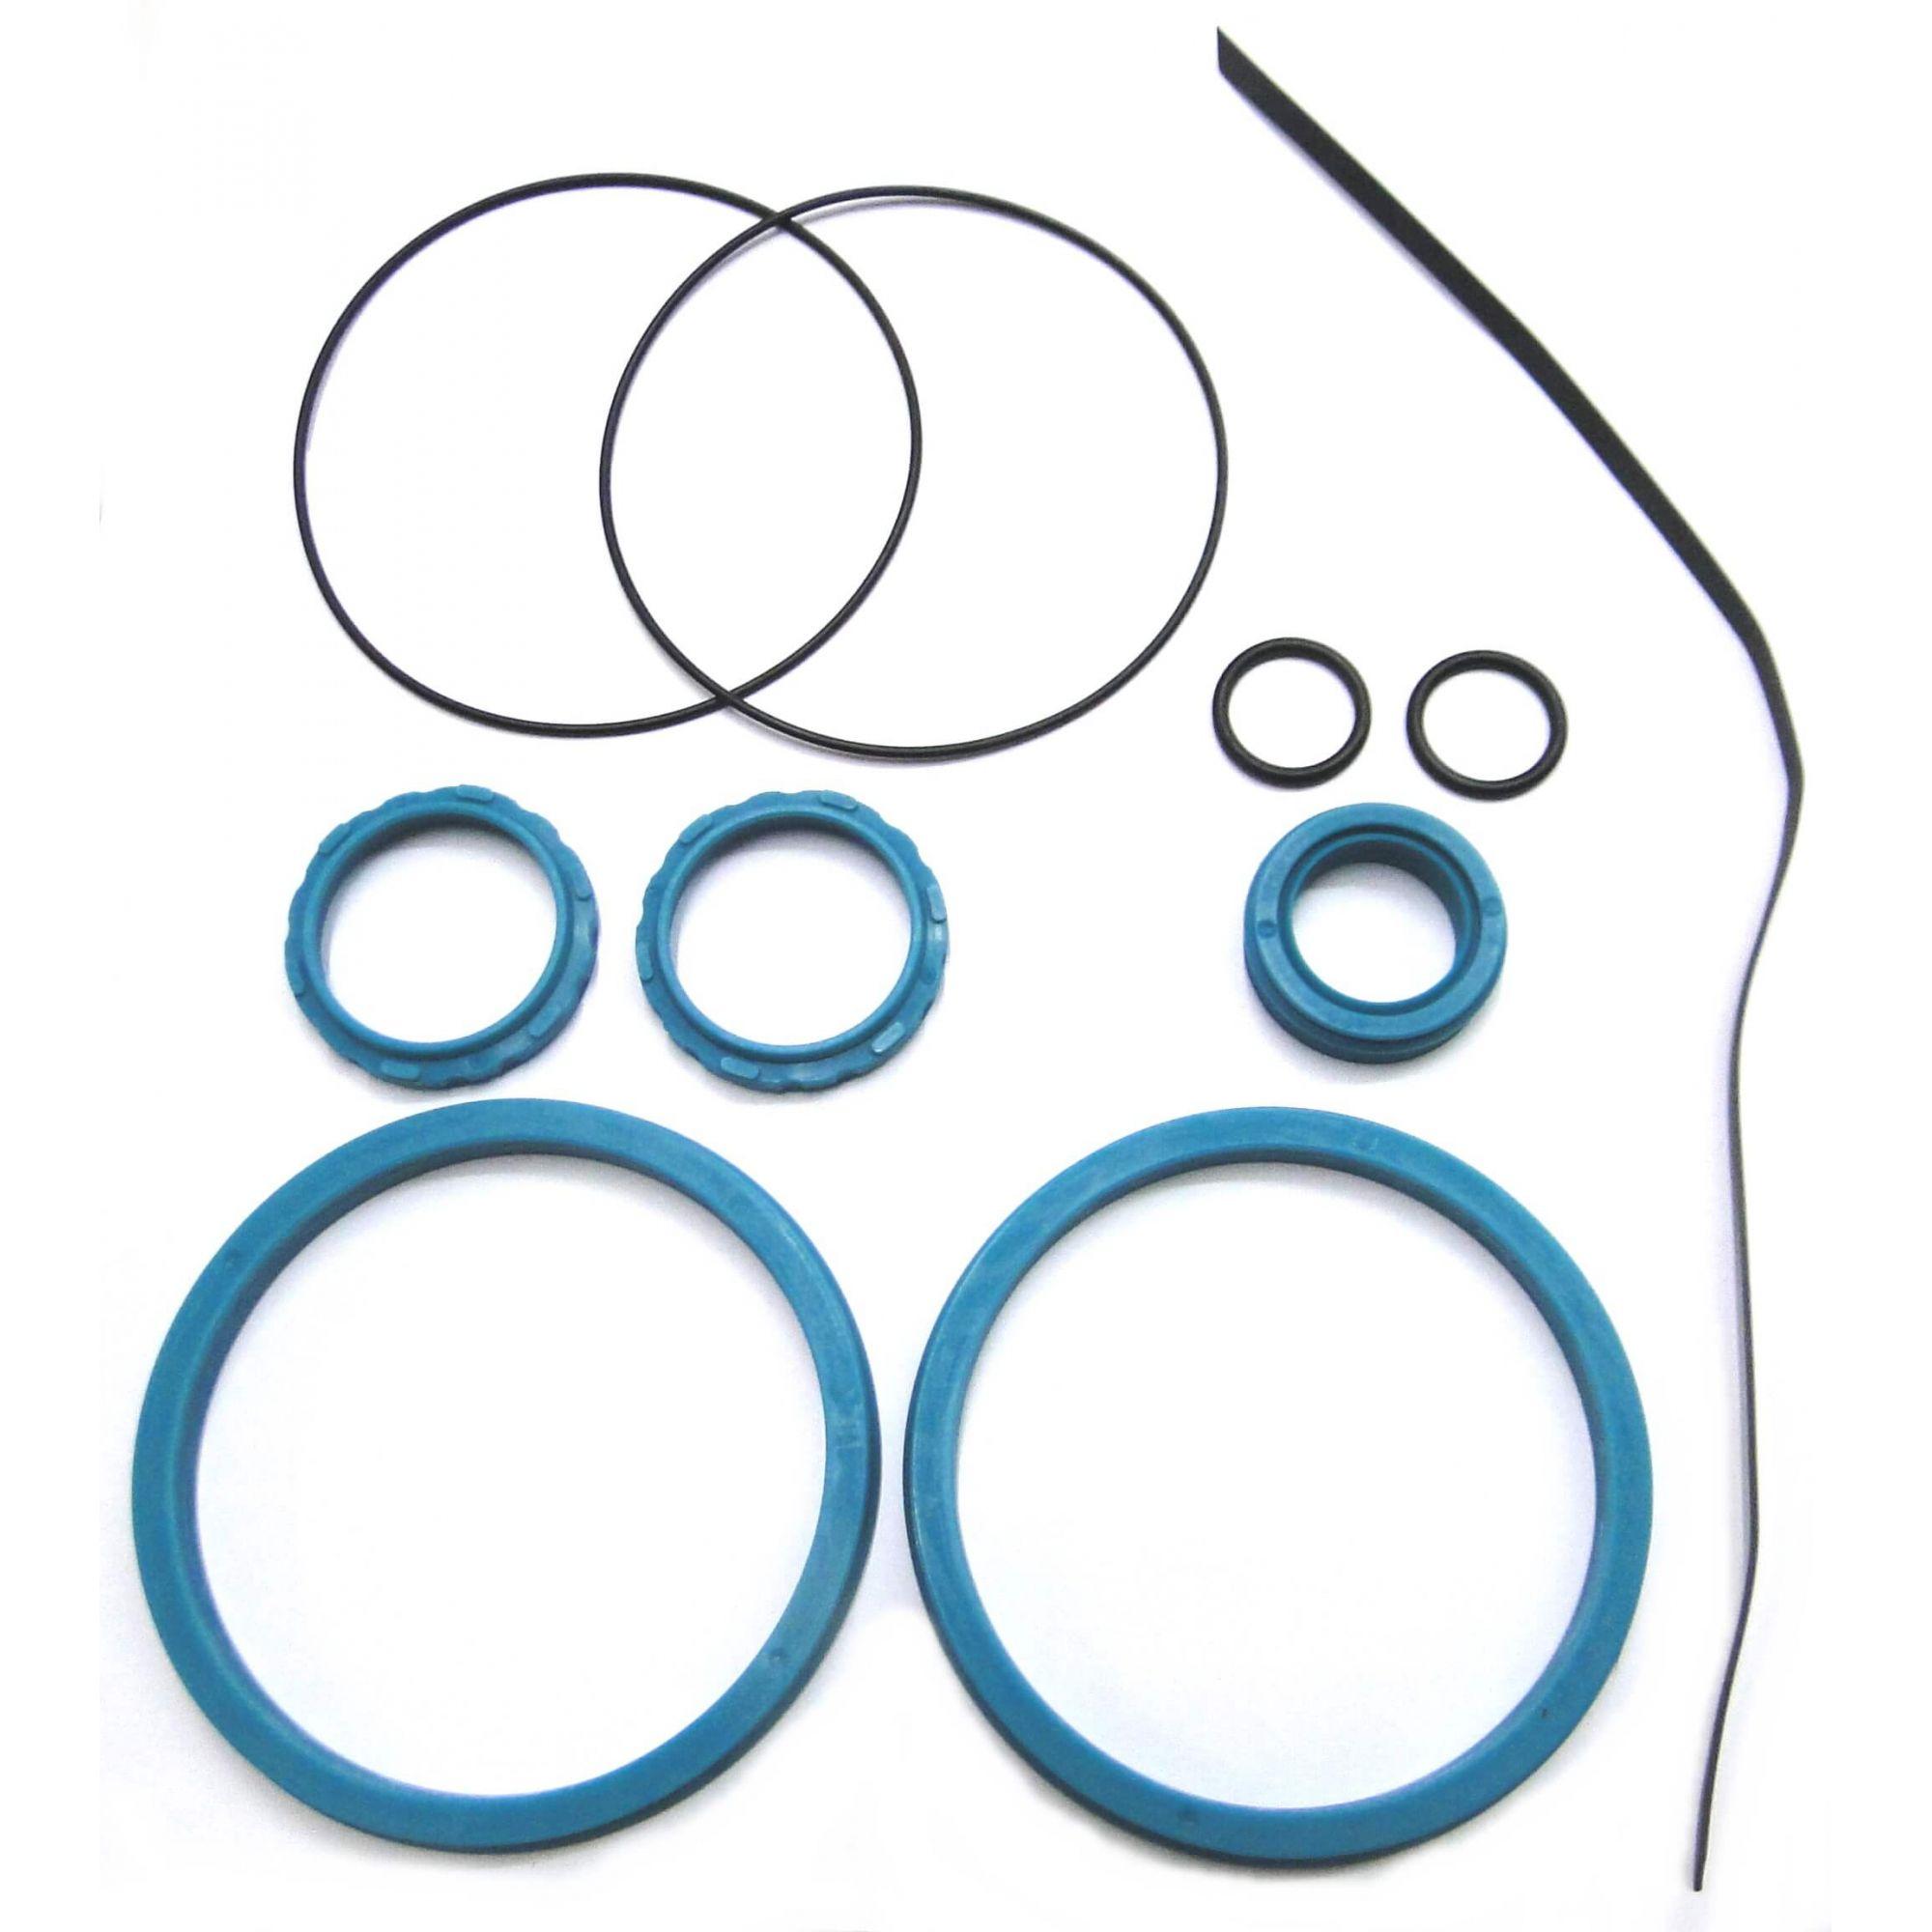 Kit Reparo para Cilindro Pneumático Haste Simples E100 Werk Schott